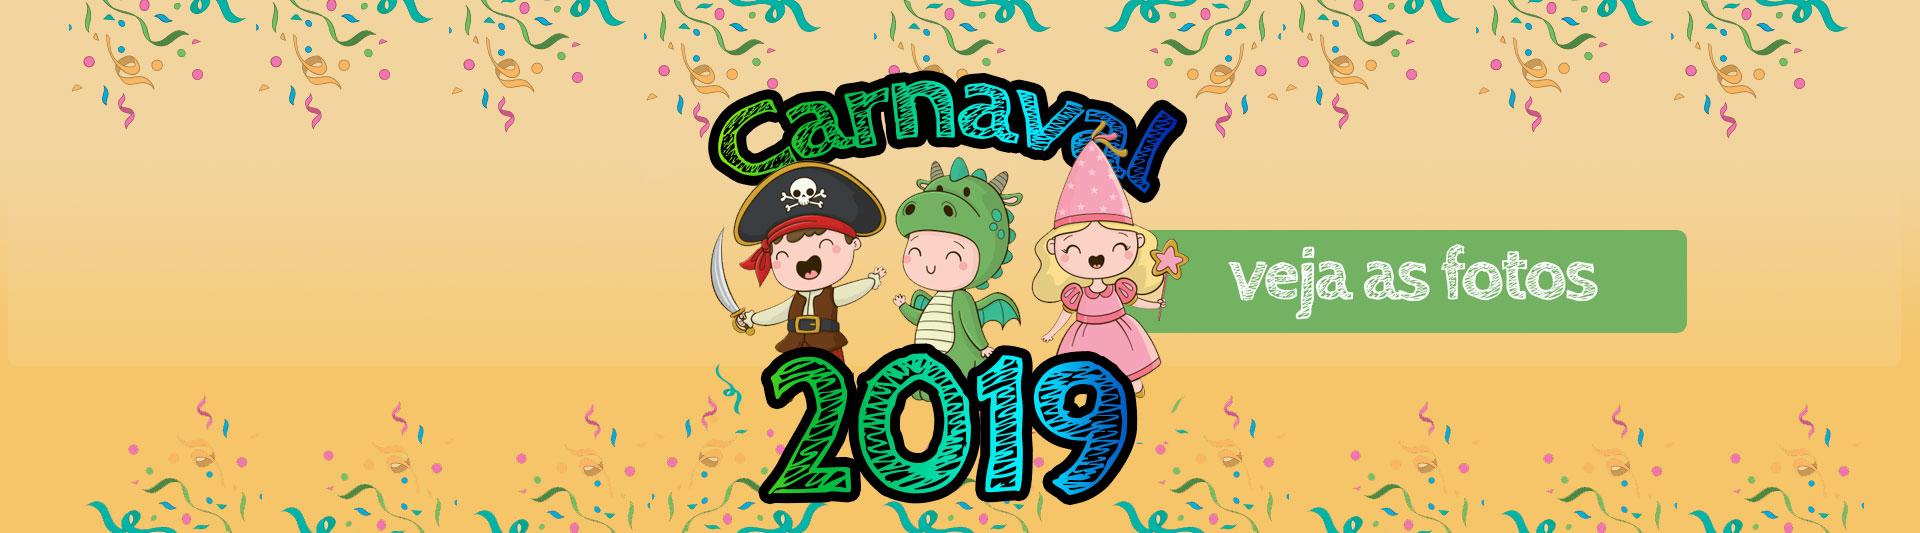 banner-carnaval-2019